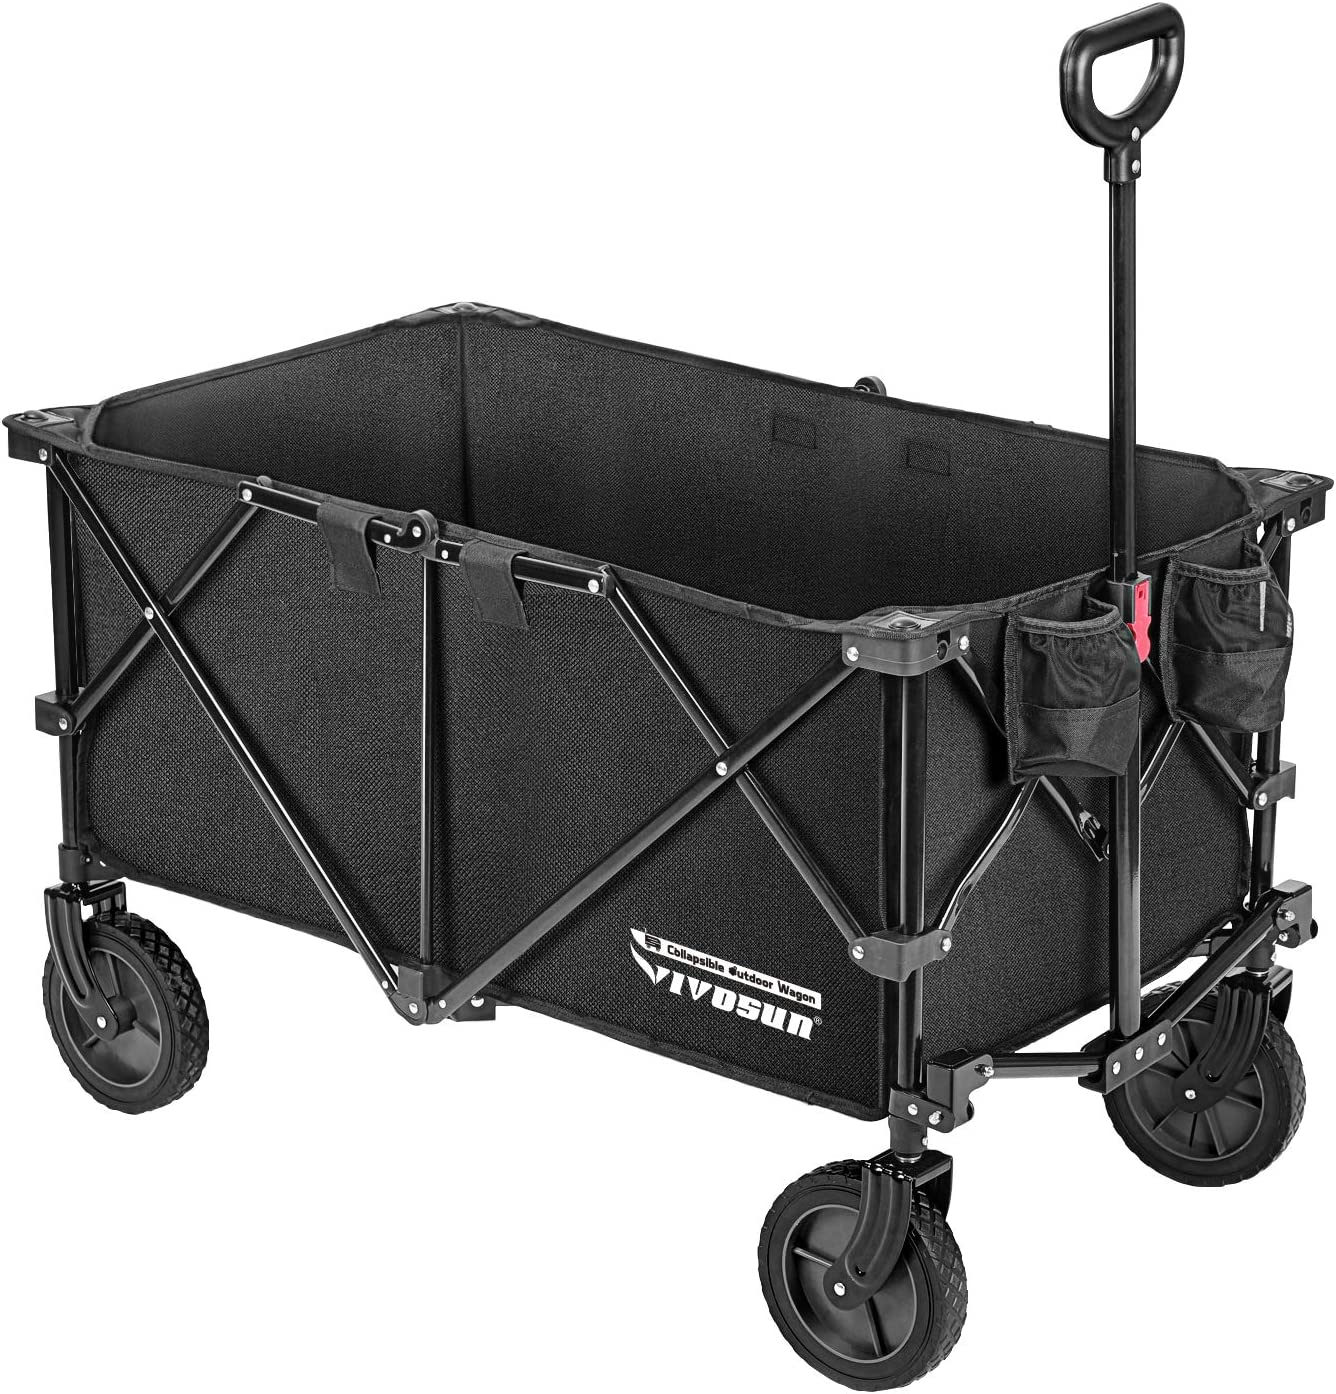 Vivosun Heavy Duty Collapsible Folding Wagon